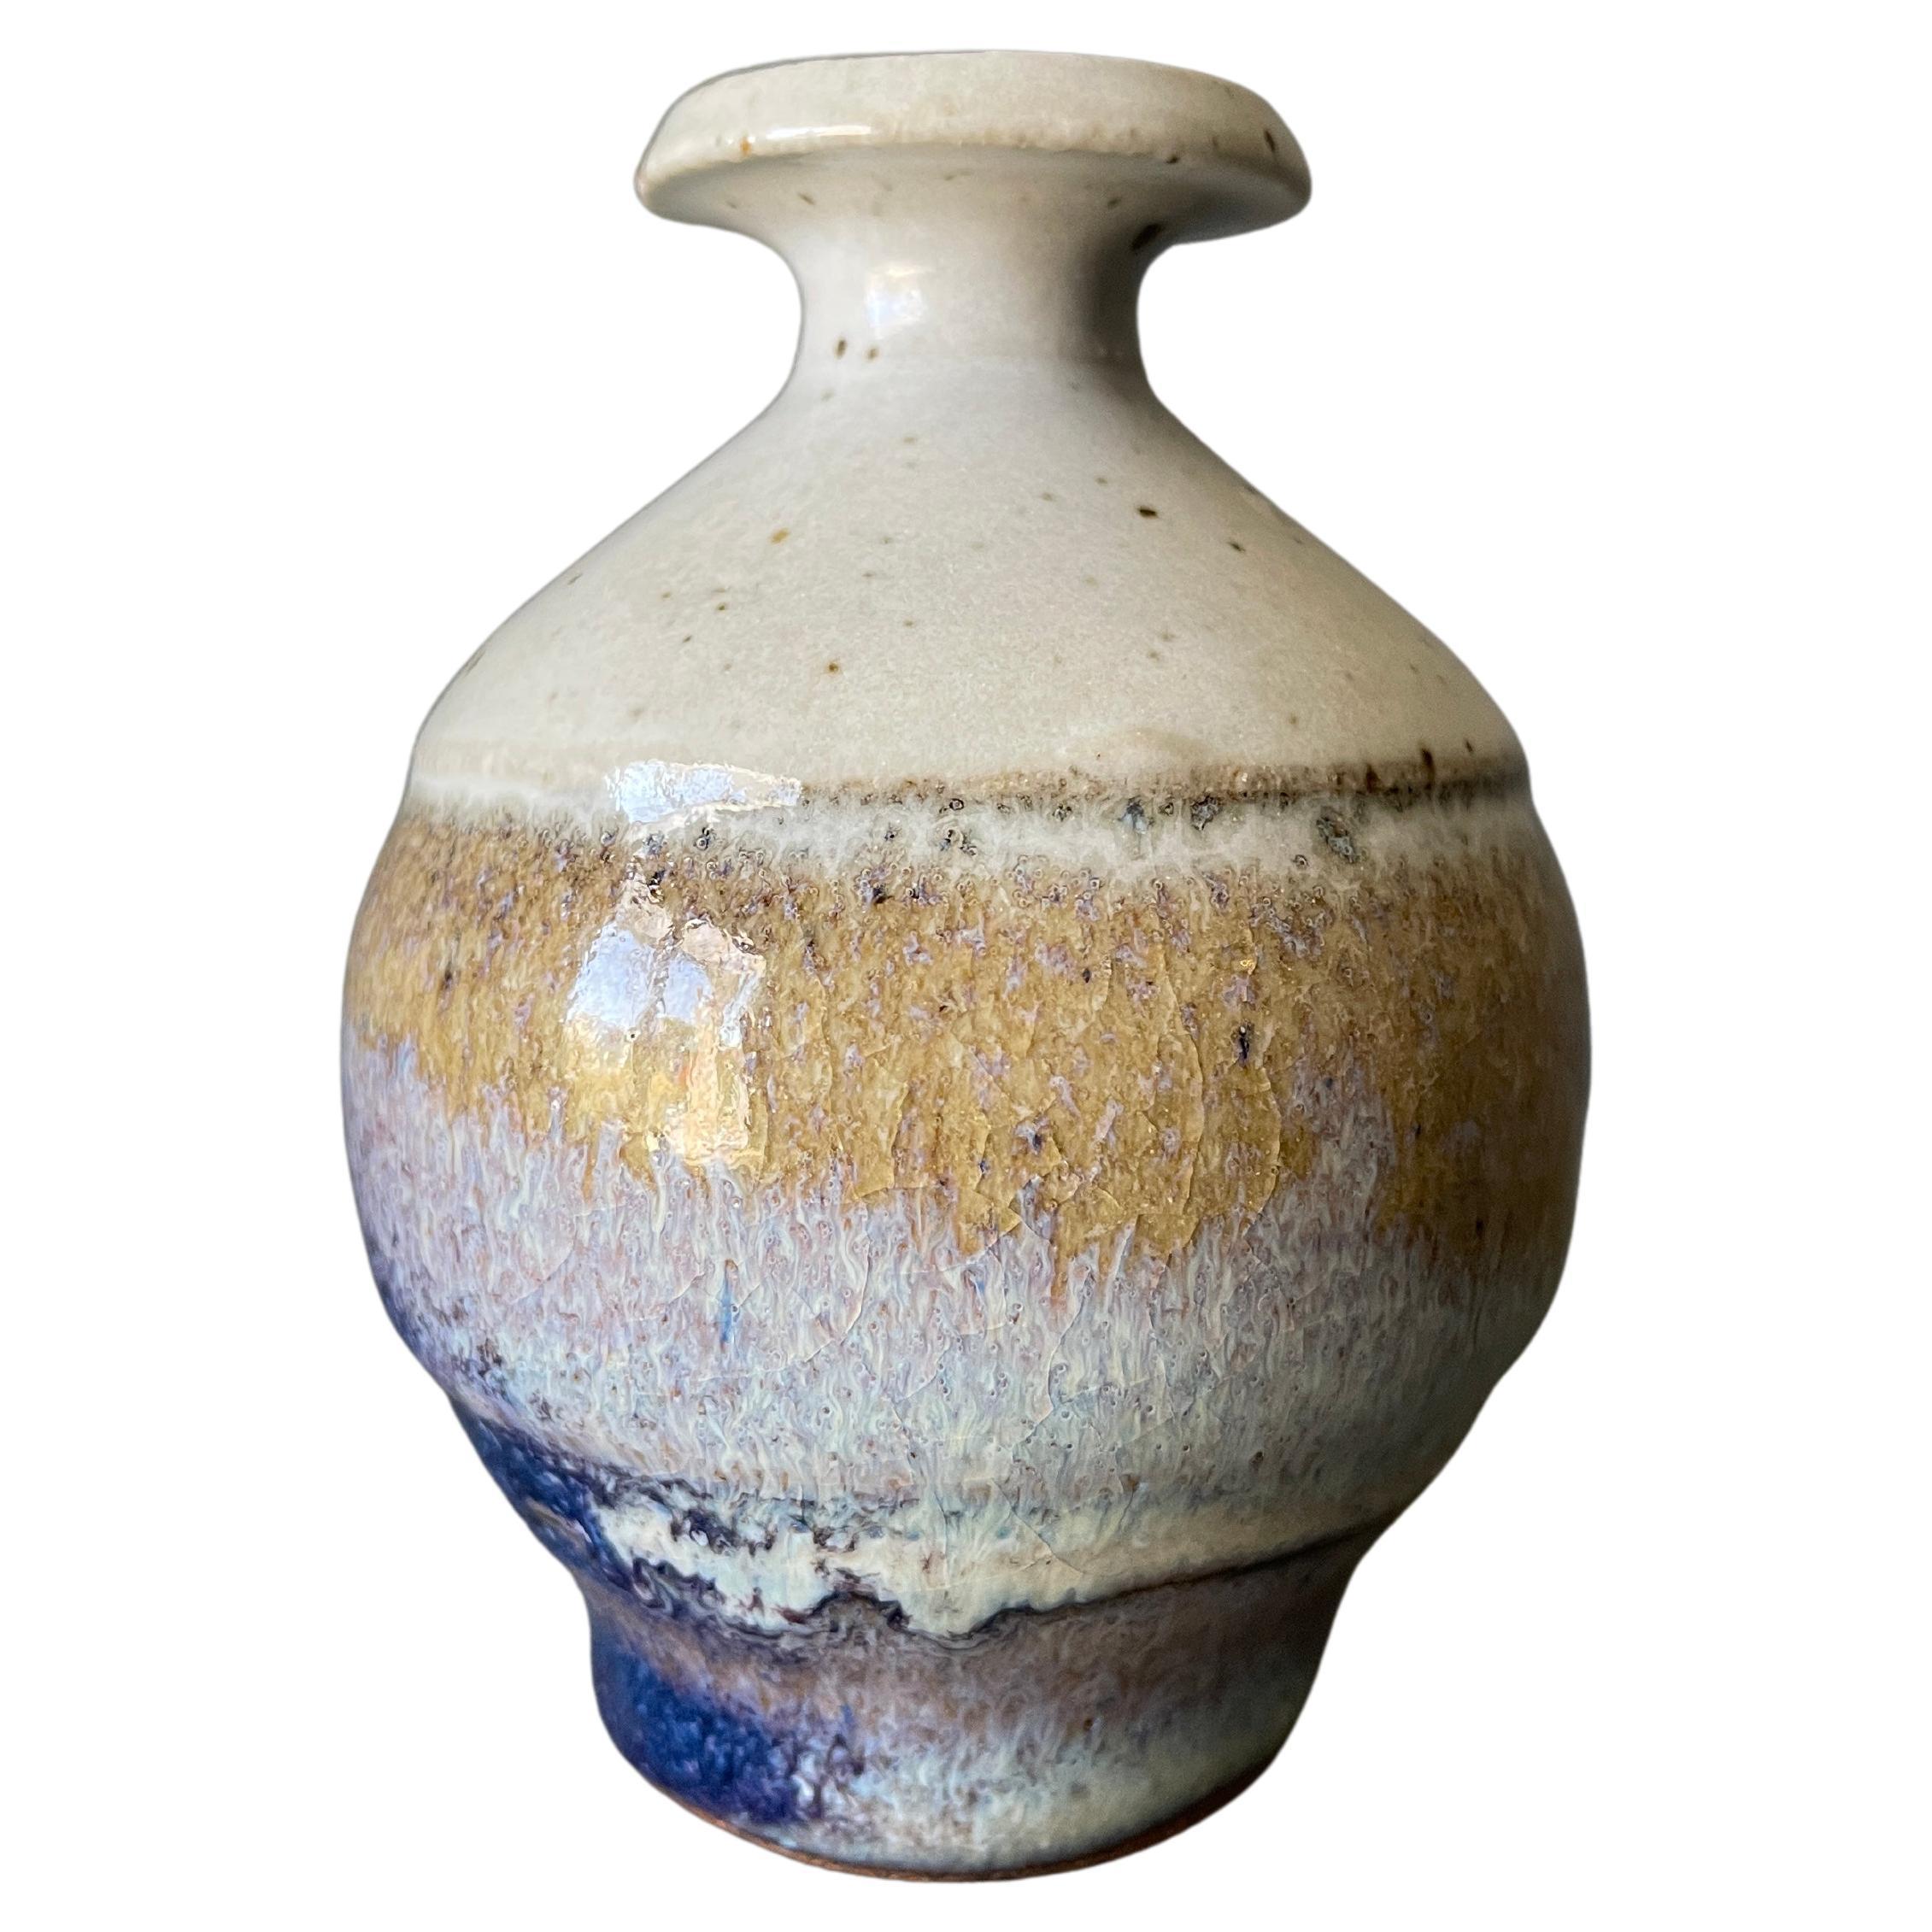 Vintage Studio Crafted Weed Pot Bud Vase circa 1960s